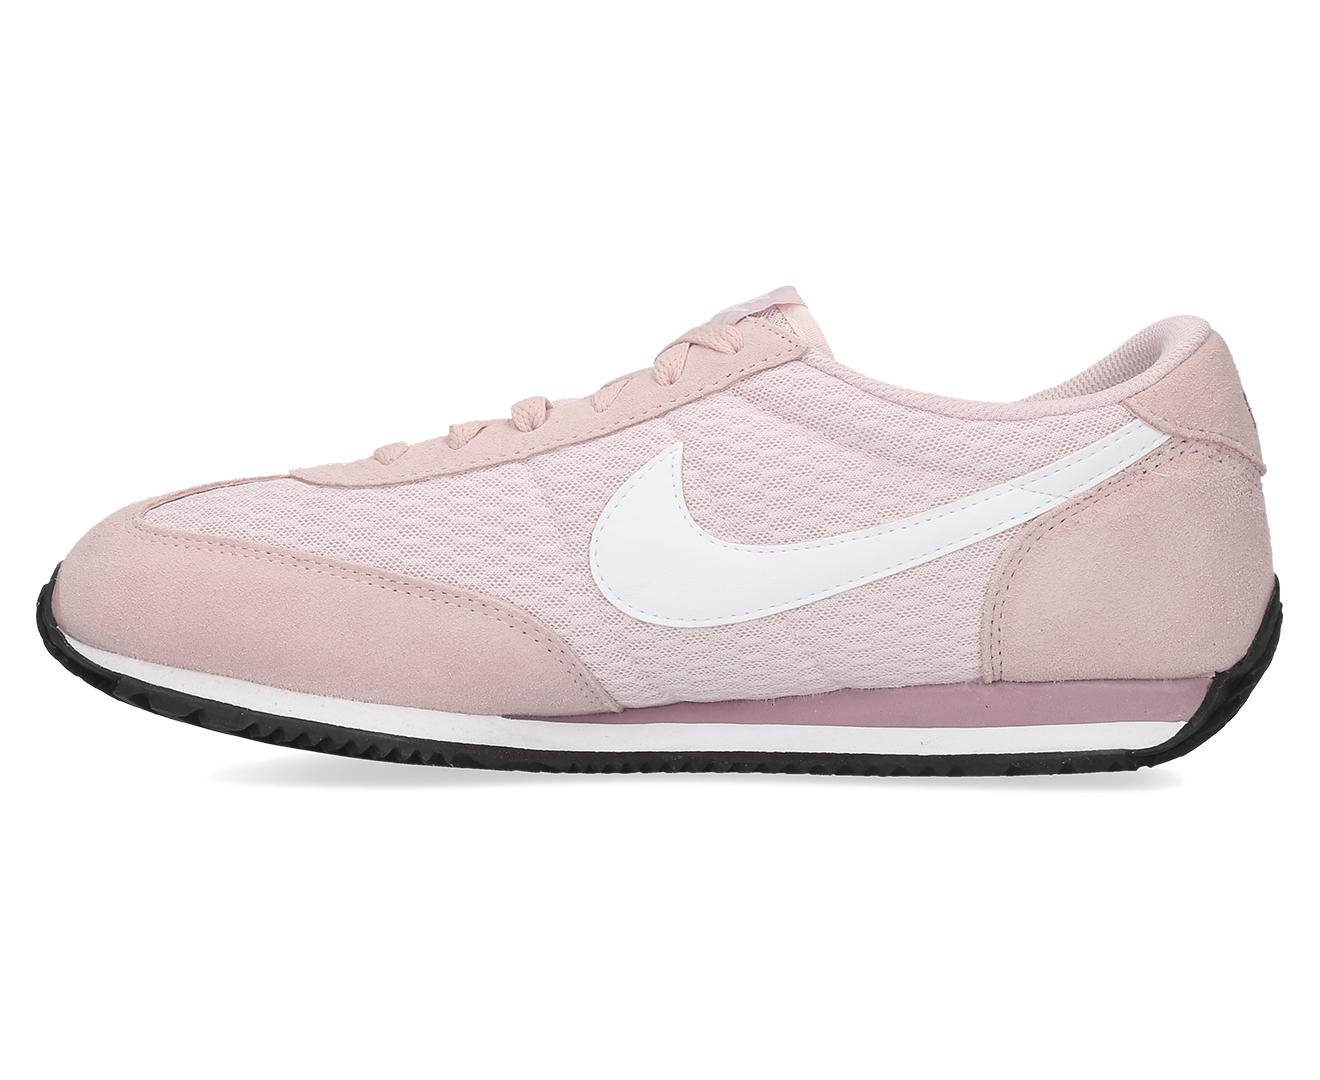 b06e8c7def5e Nike Women s Oceania Textile Shoe - Barely Rose White